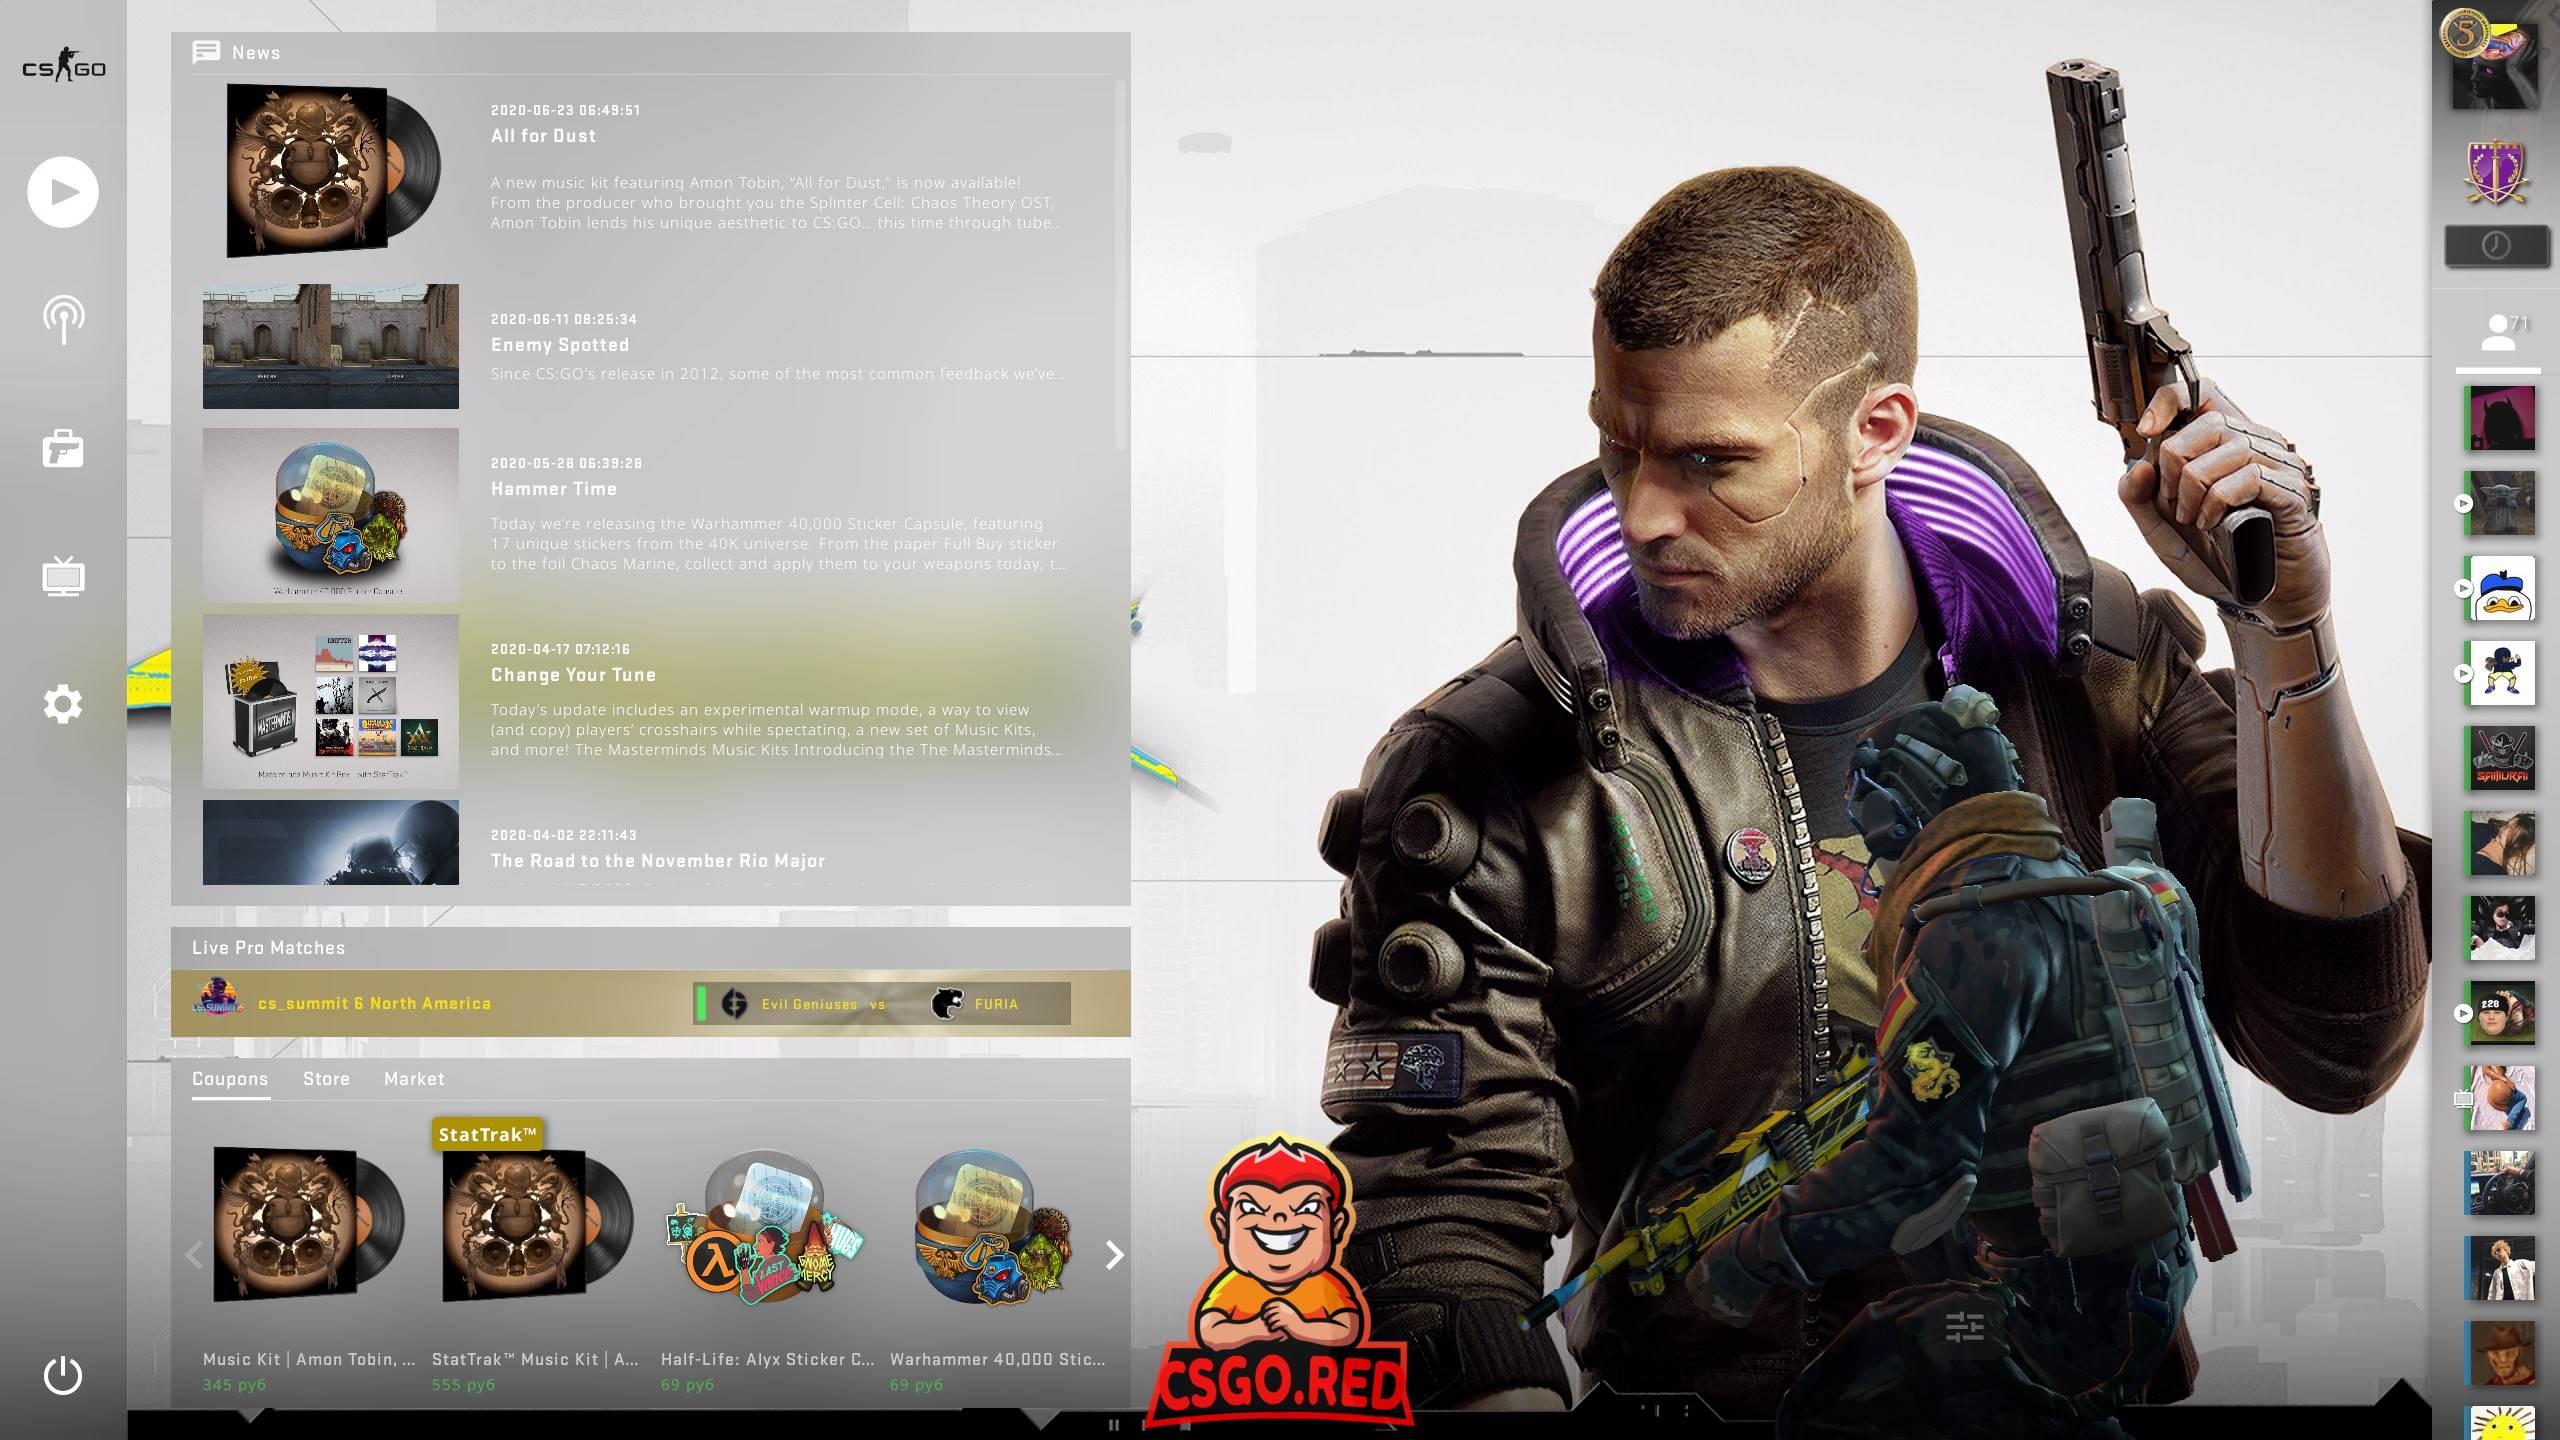 Cyberpunk 2077 Protagonist with gun panorama ui background